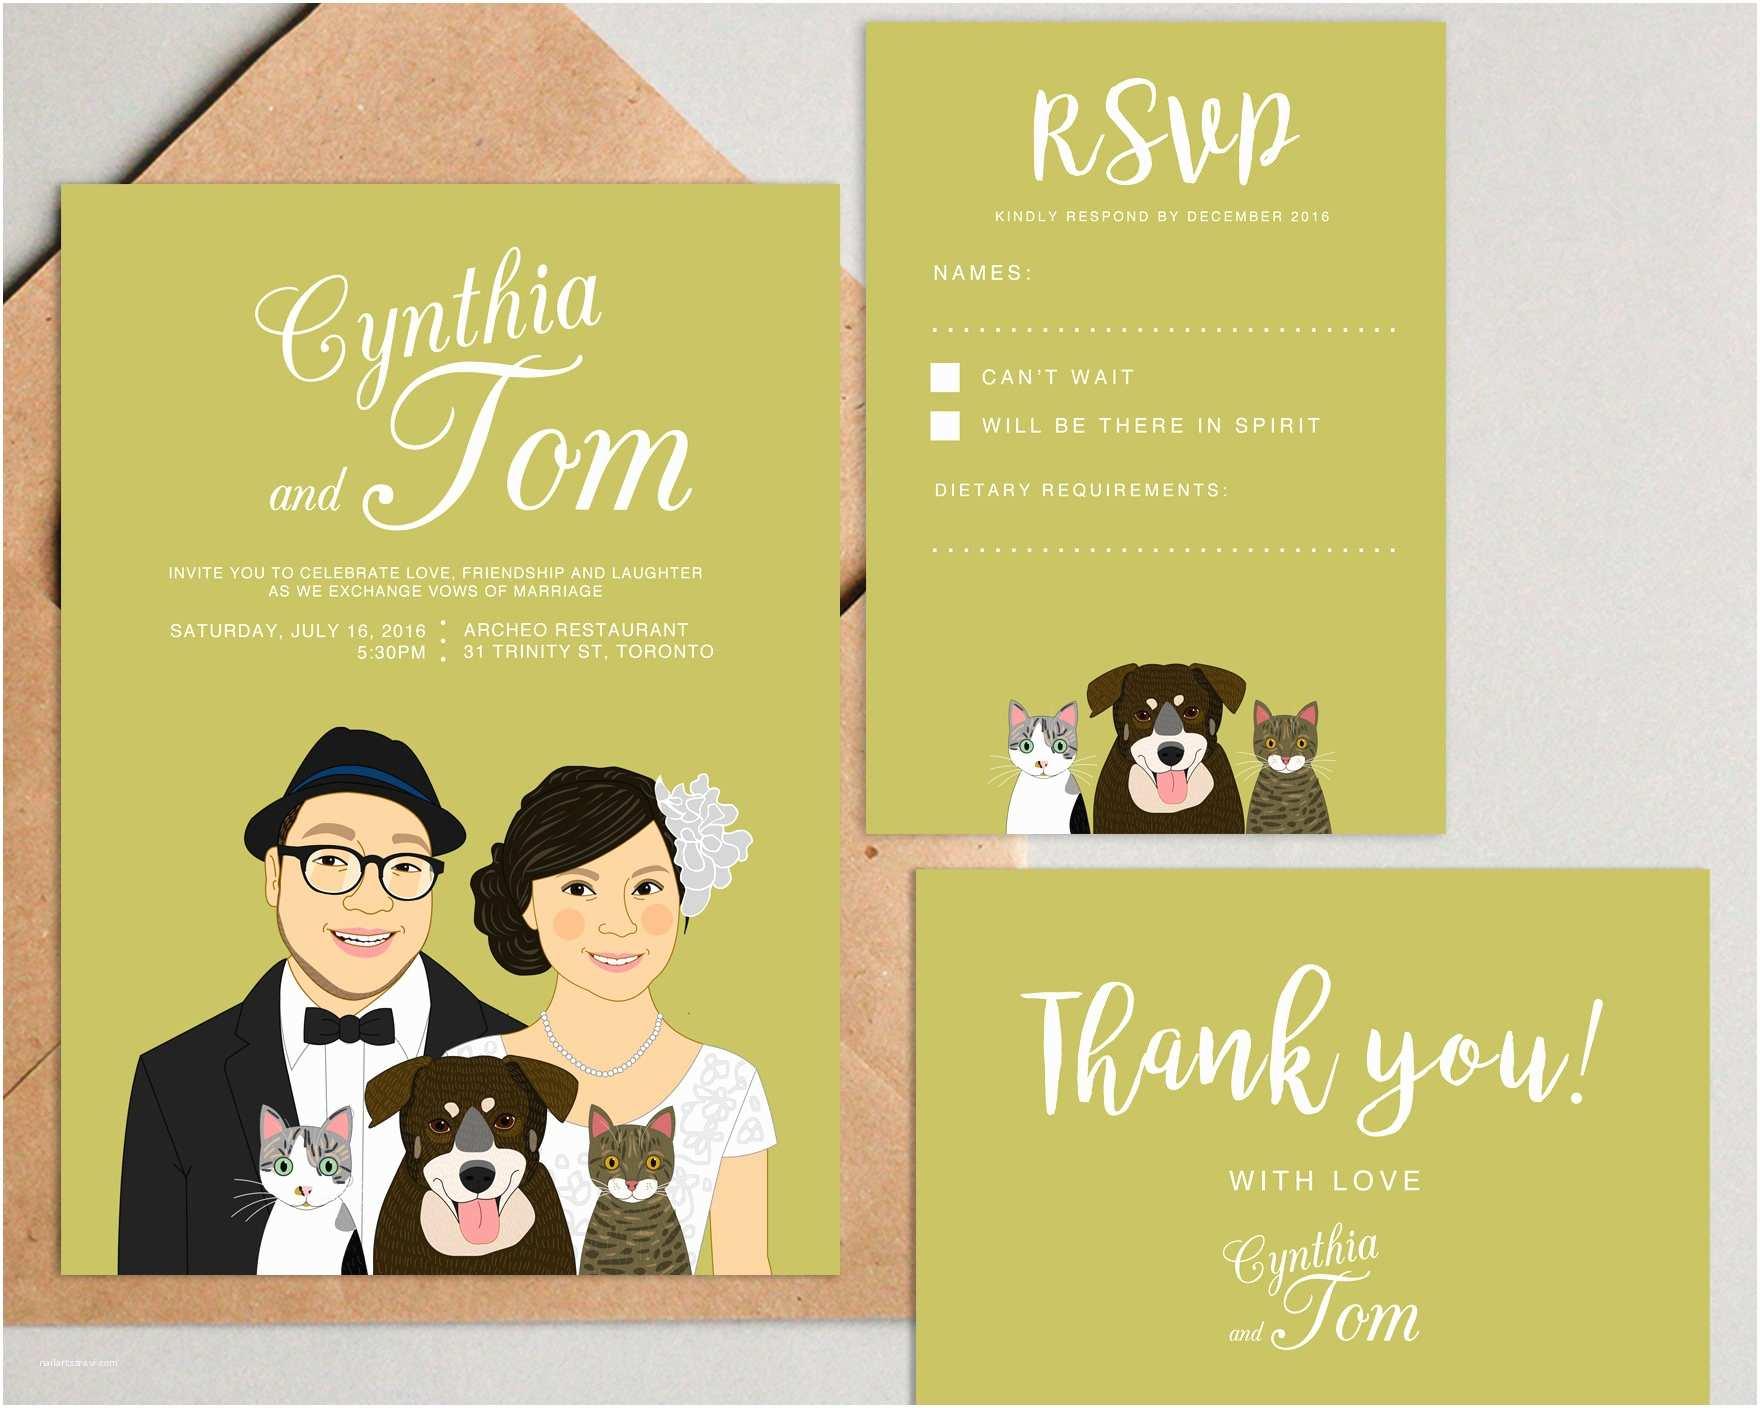 Cool Wedding Invitations 75 Fun Unique Wedding Invitations for Cool Couples